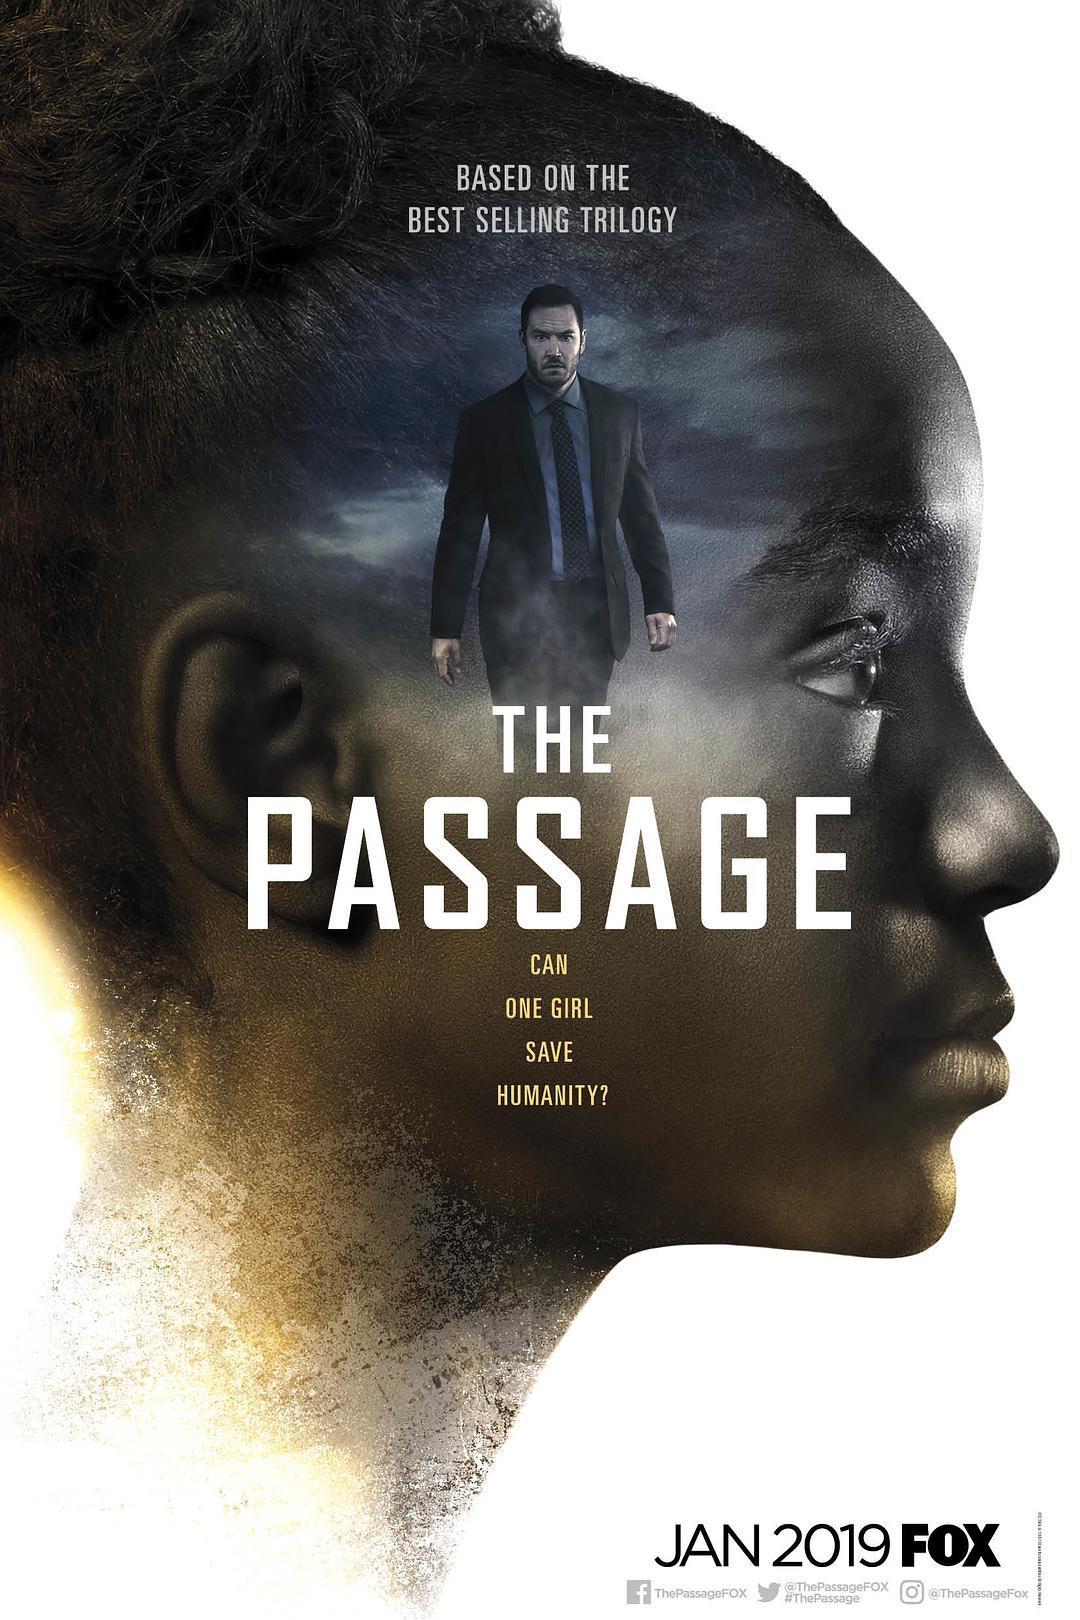 The Passag